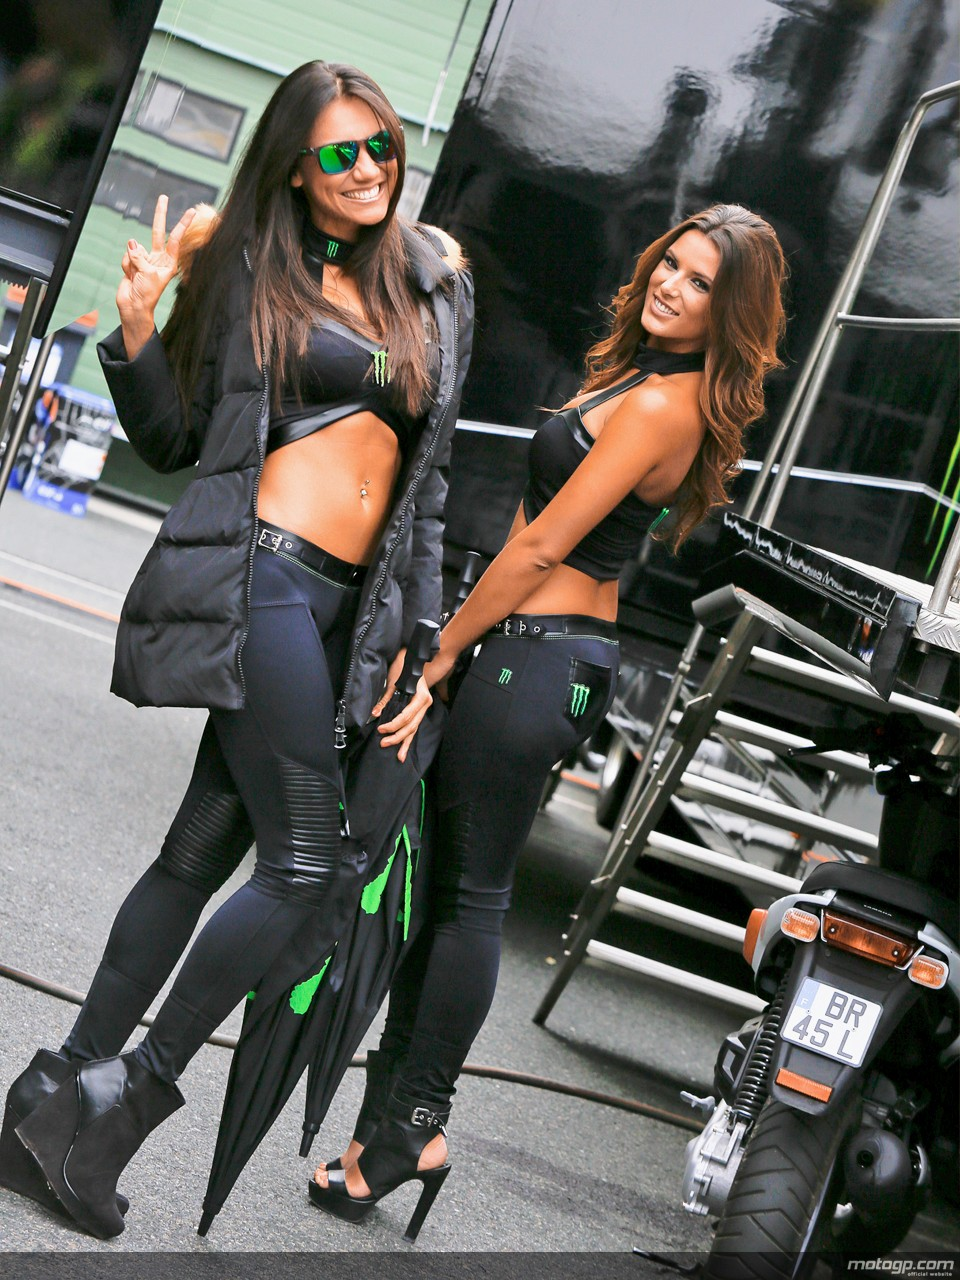 Paddock Girls At Brno